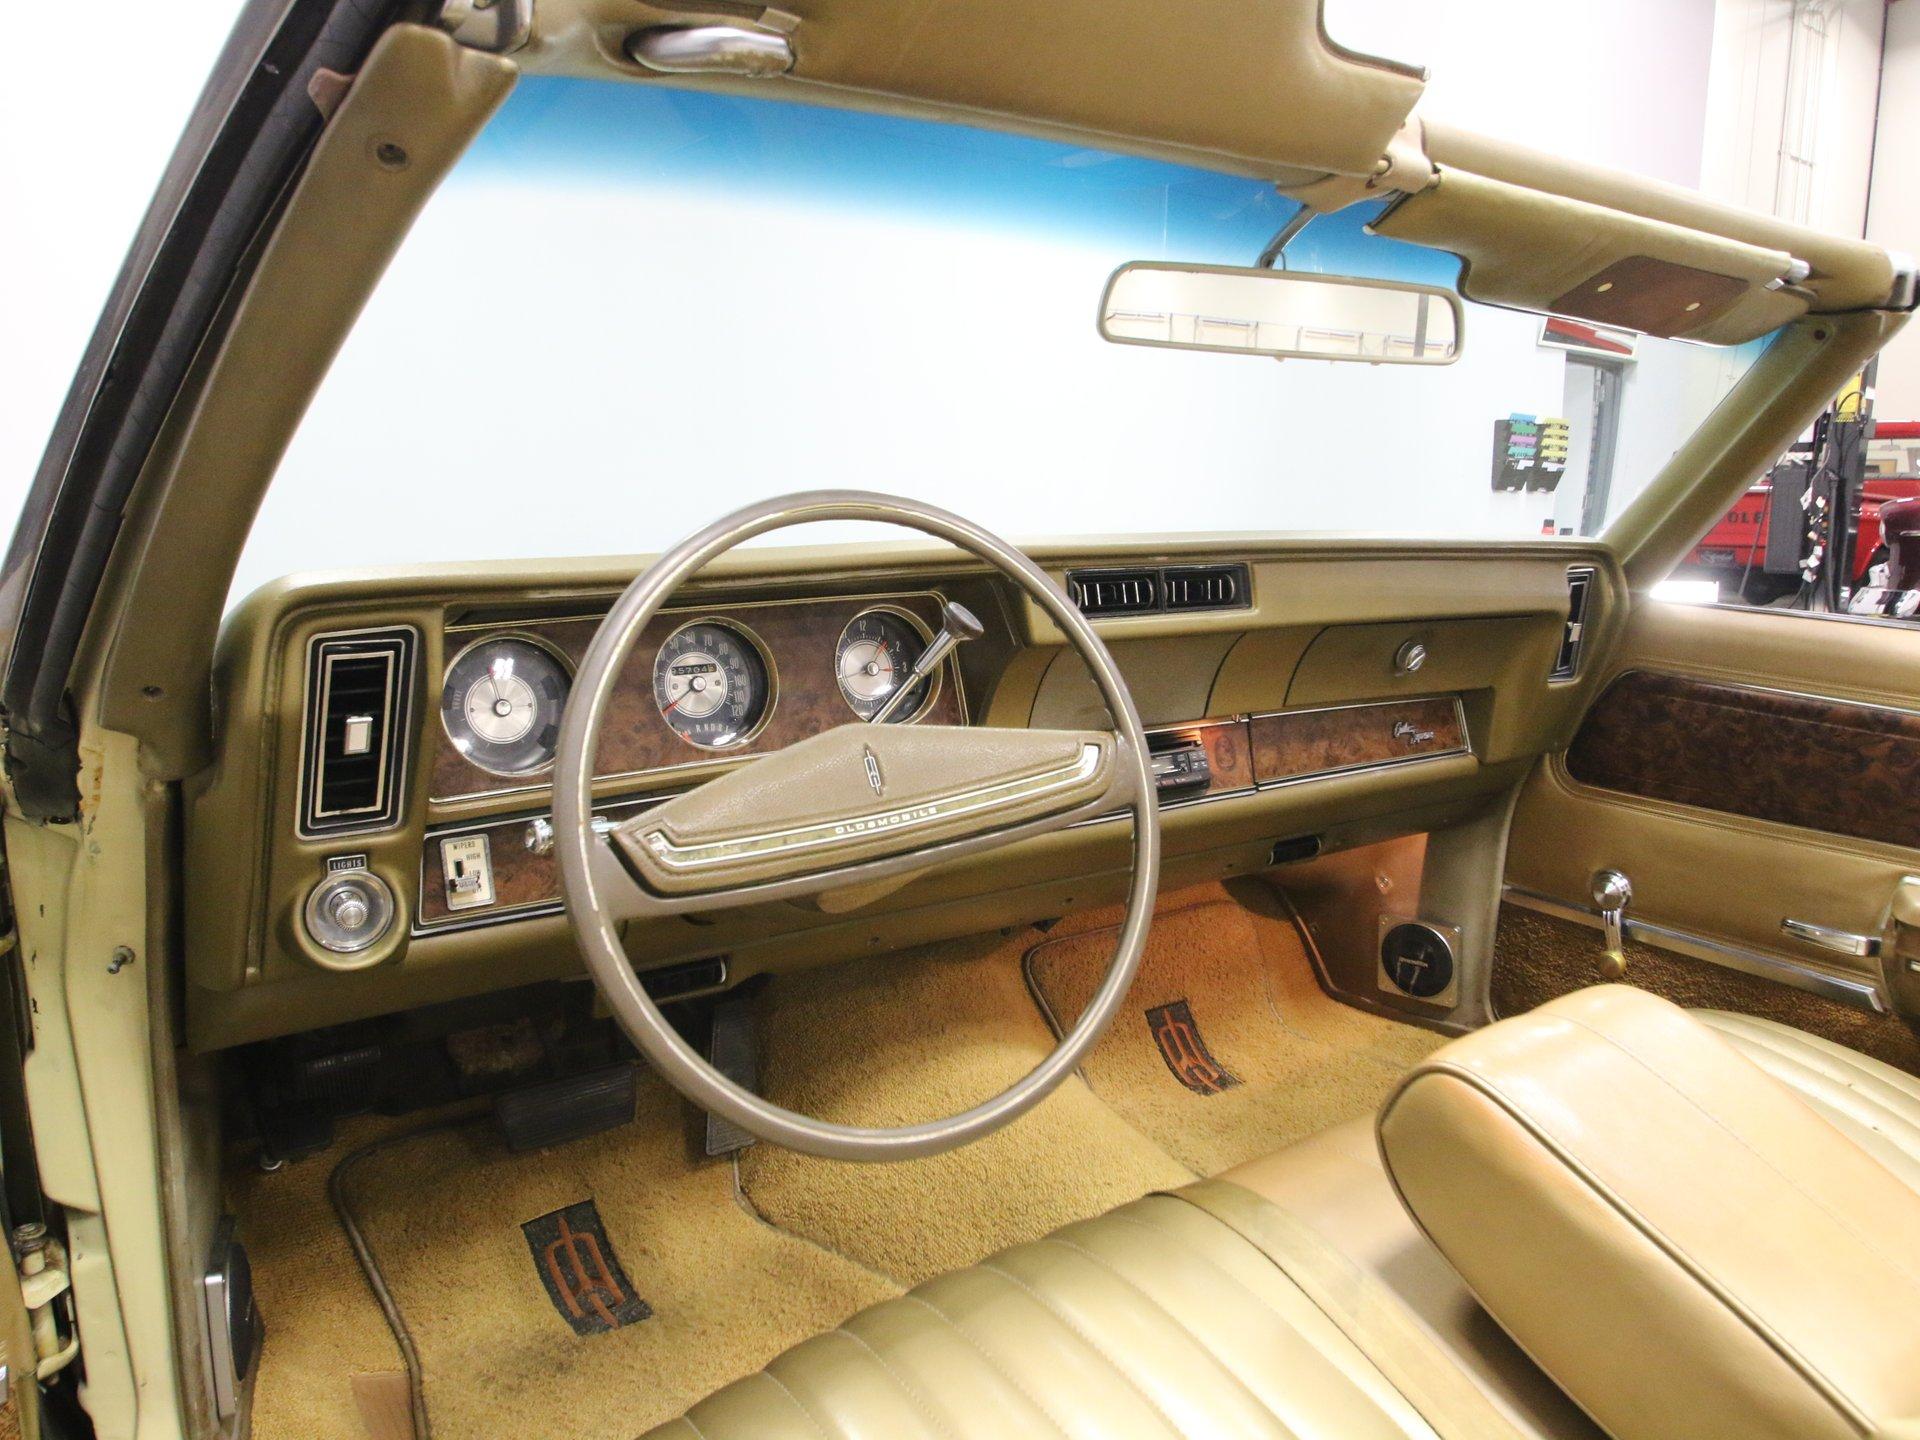 1970 Oldsmobile Cutlass | Streetside Classics - The Nation's